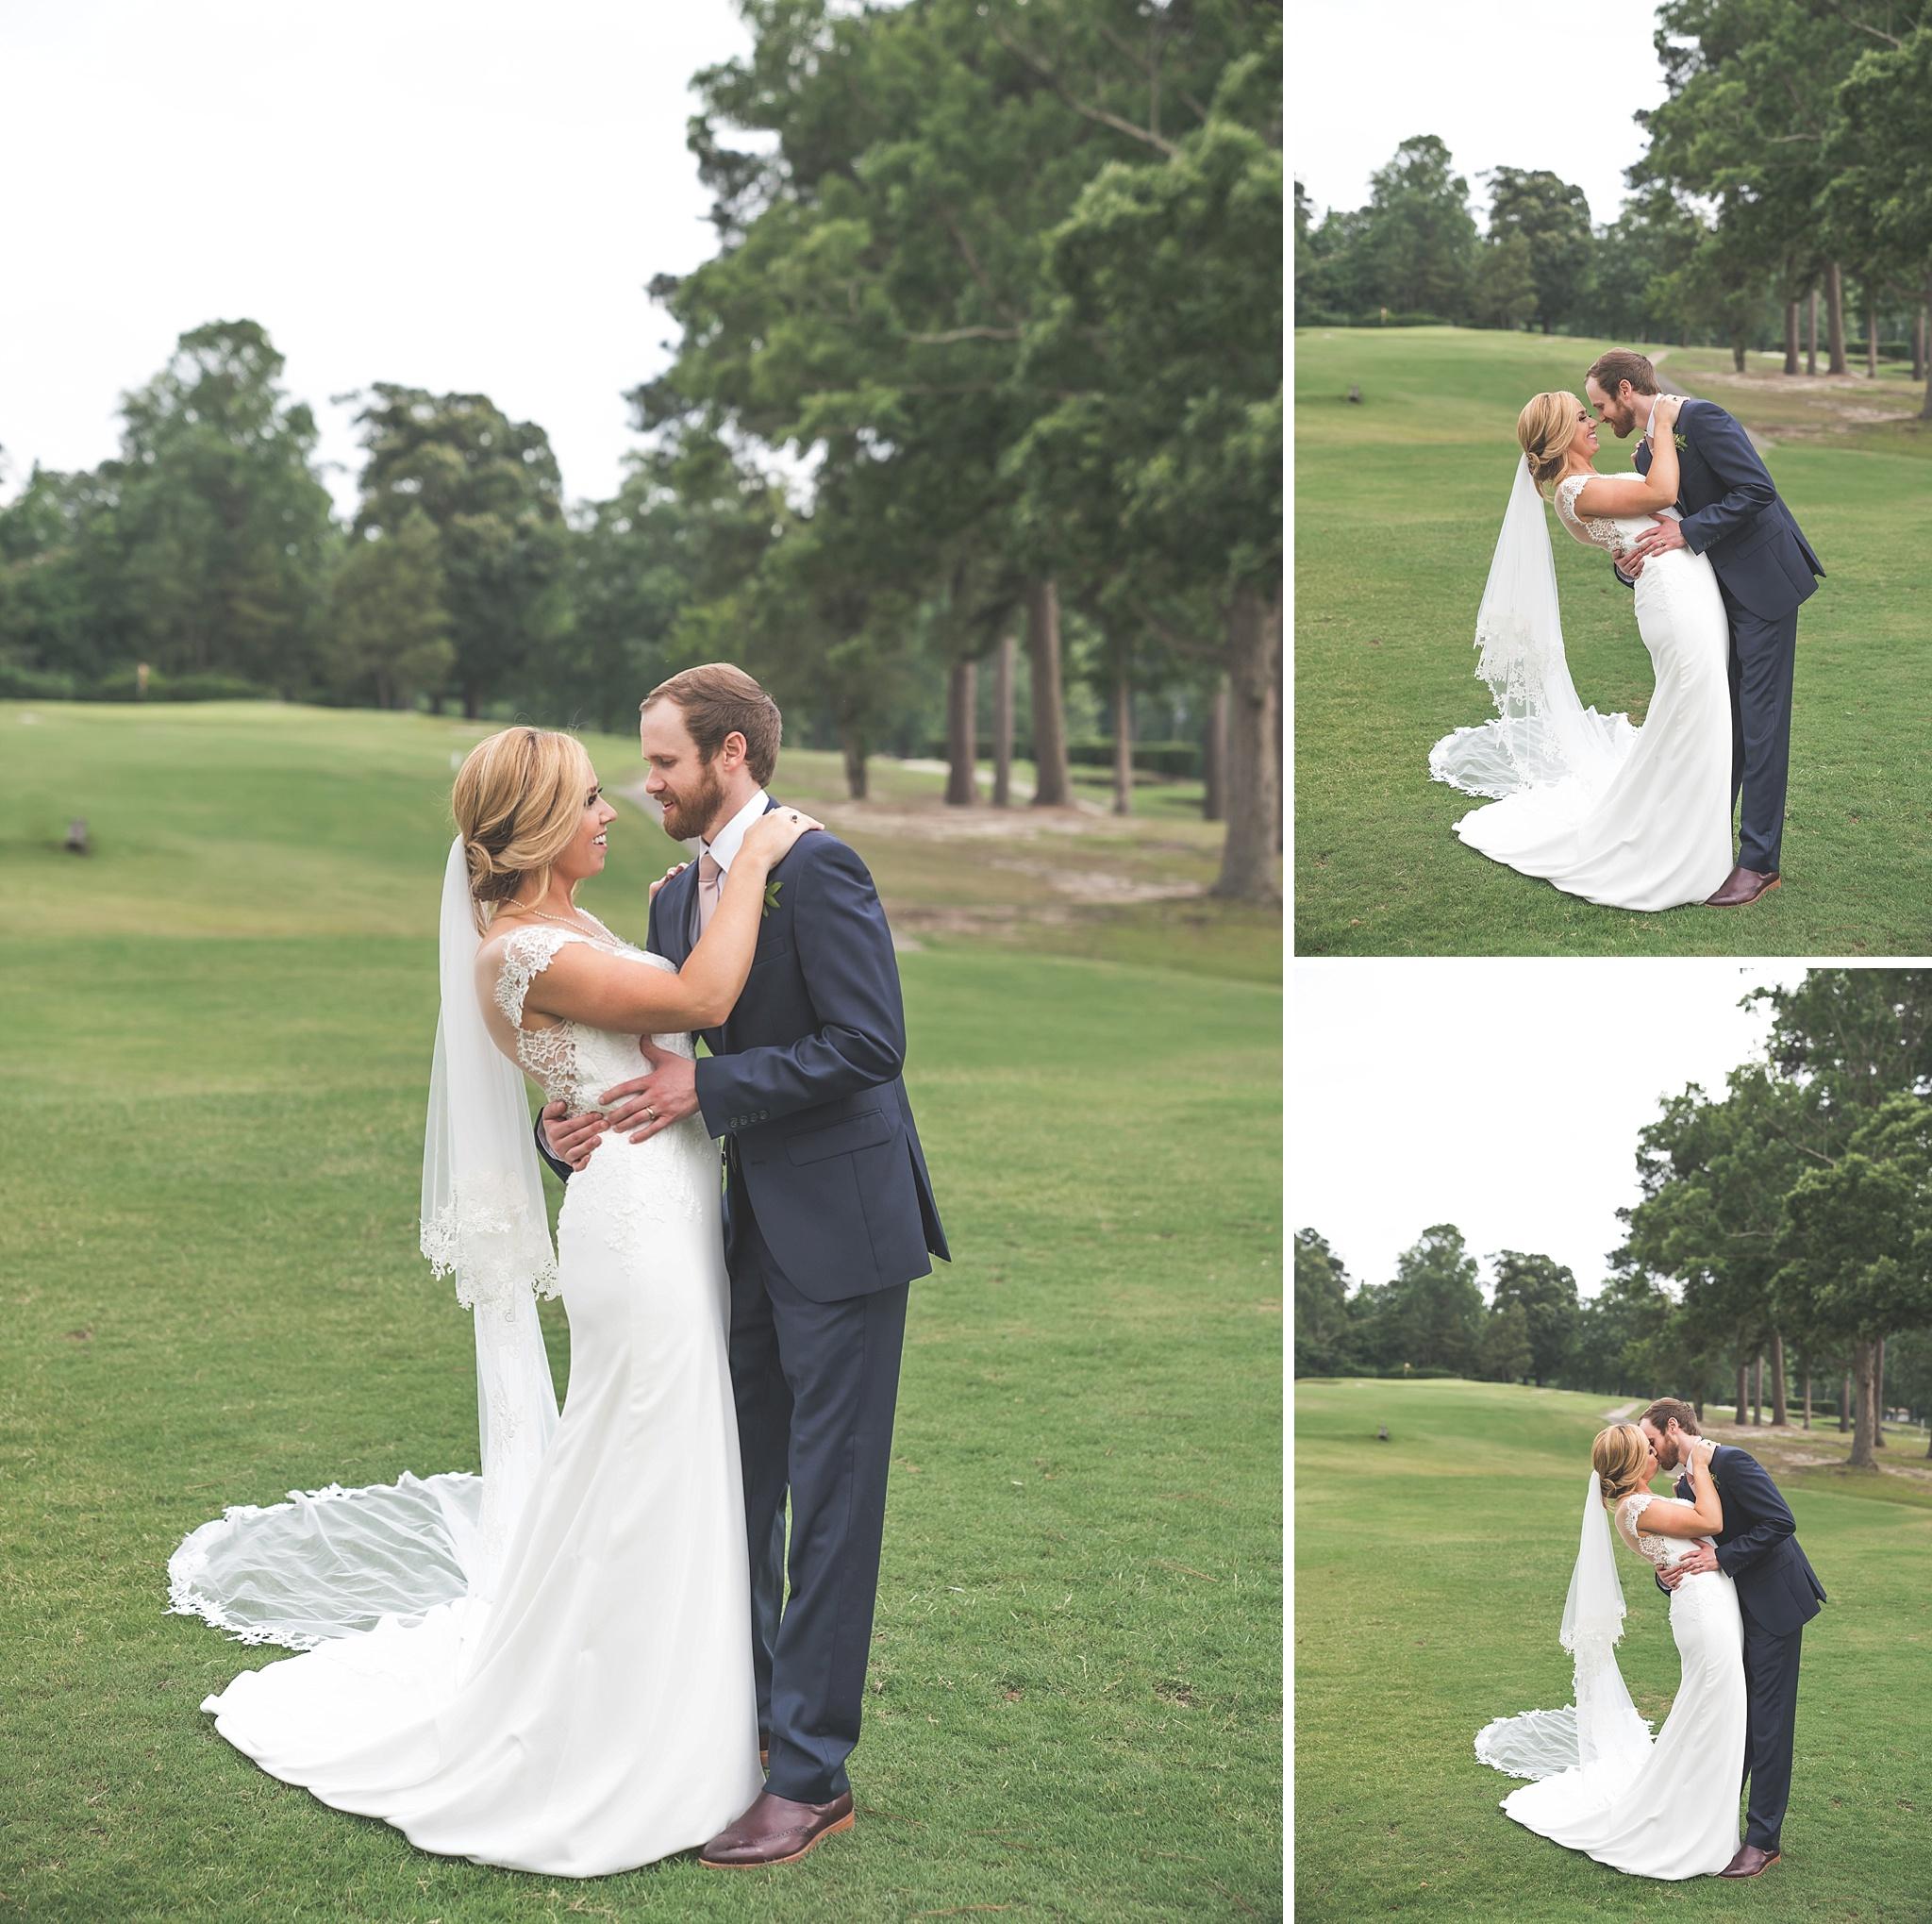 Williamston-NC-Wedding-Photographer-035.jpg